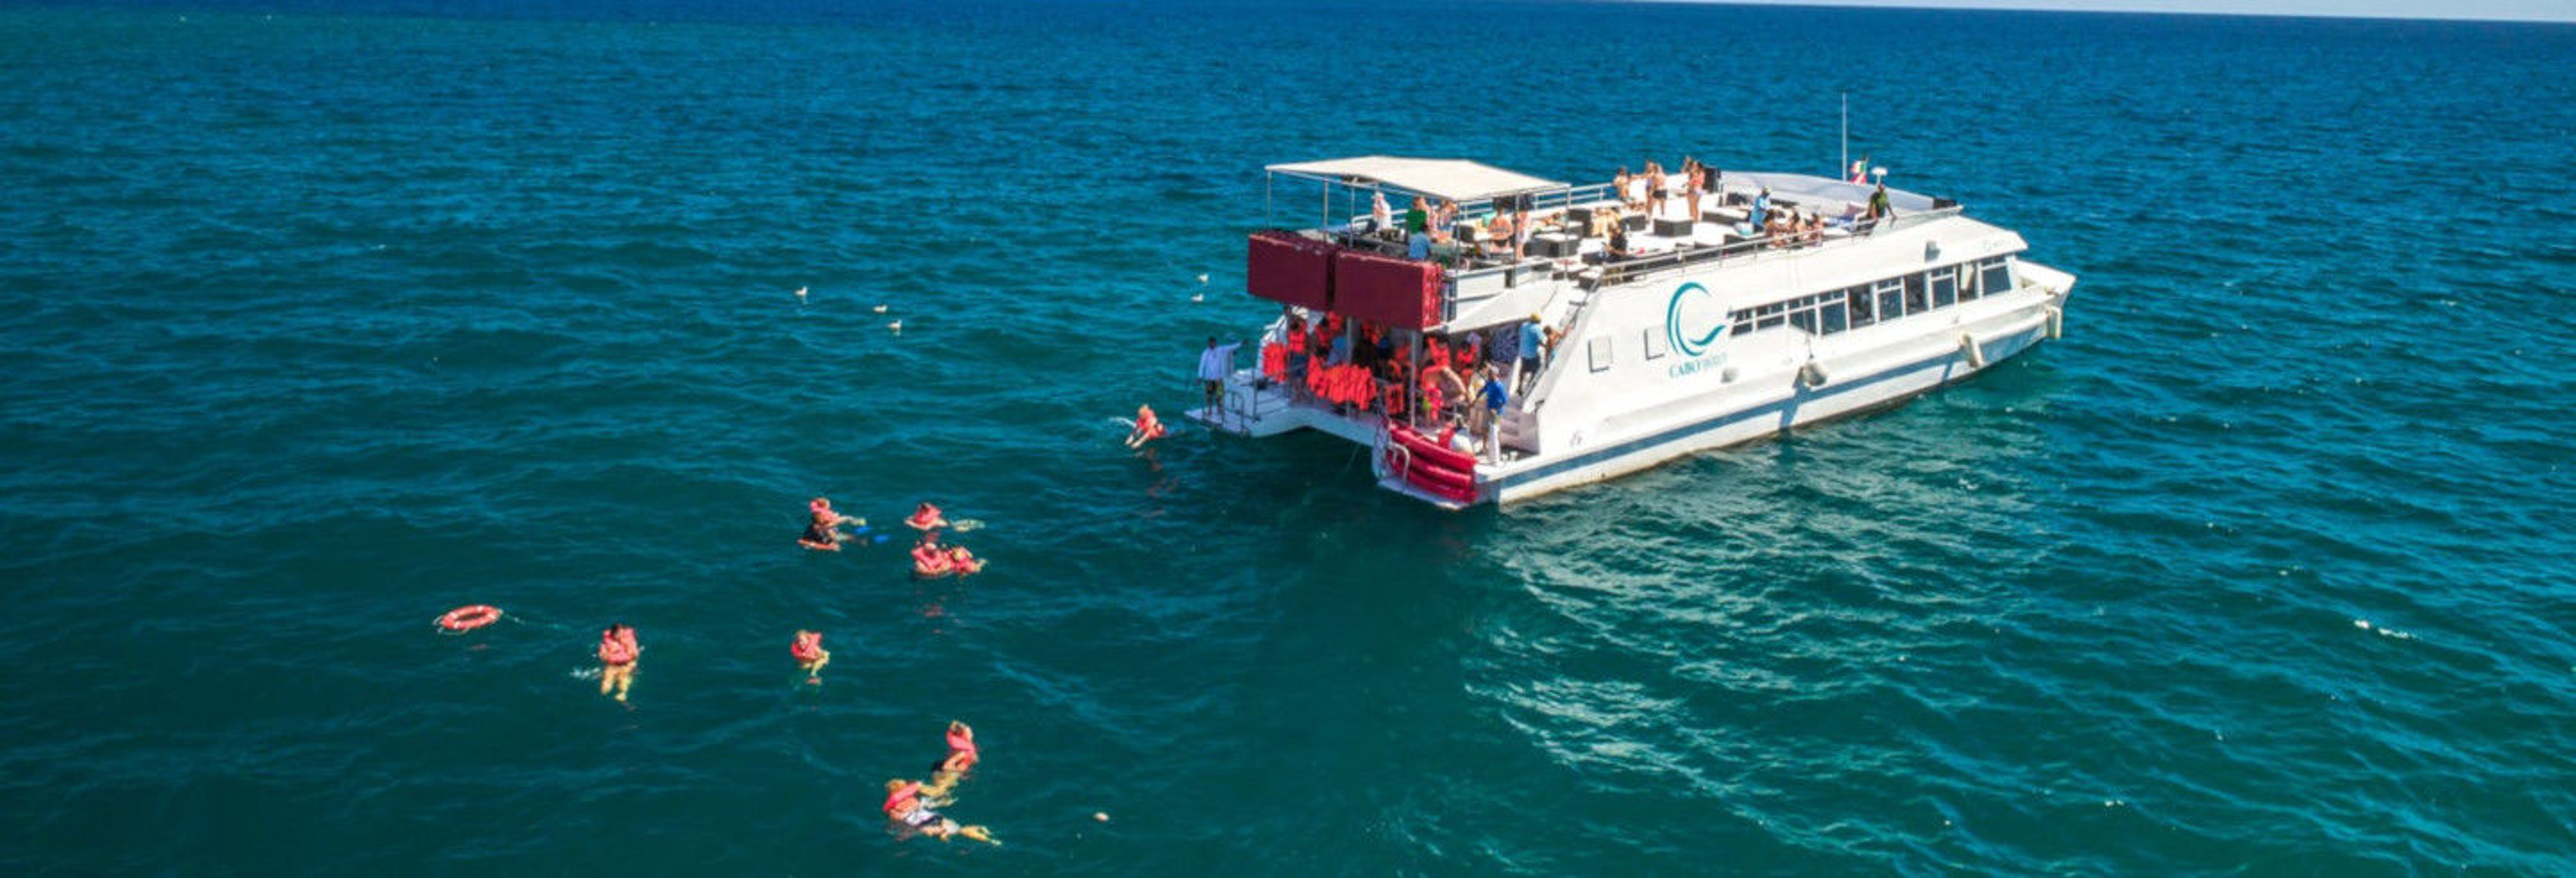 Balade en catamaran dans le golfe de Californie